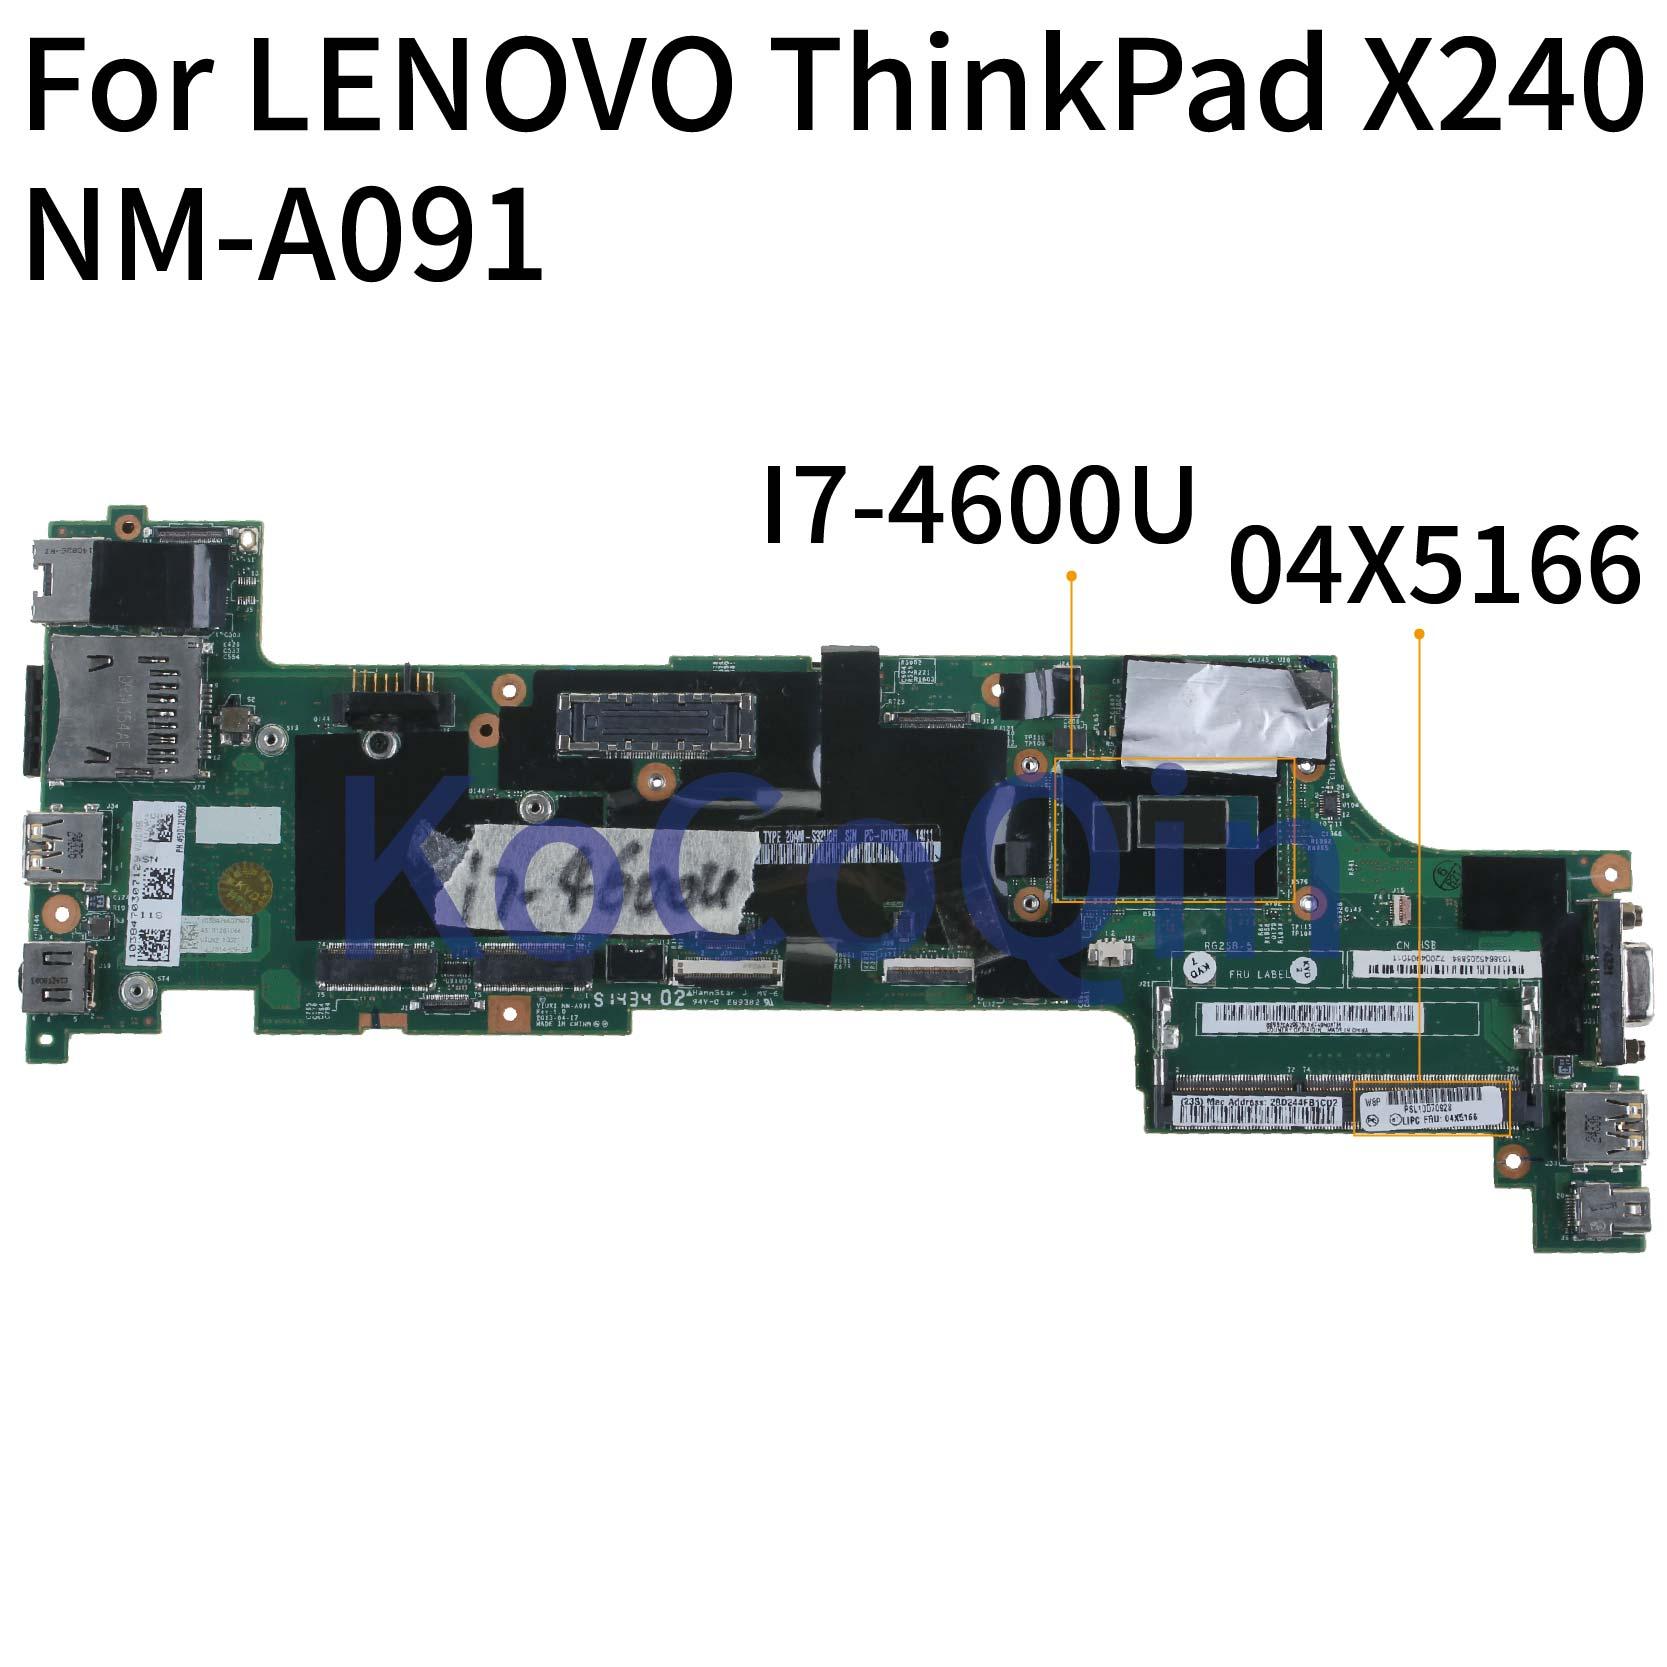 KoCoQin Laptop Motherboard For LENOVO ThinkPad X240 I7-4600U Mainboard 04X5166 04X5178 VIUX1 NM-A091